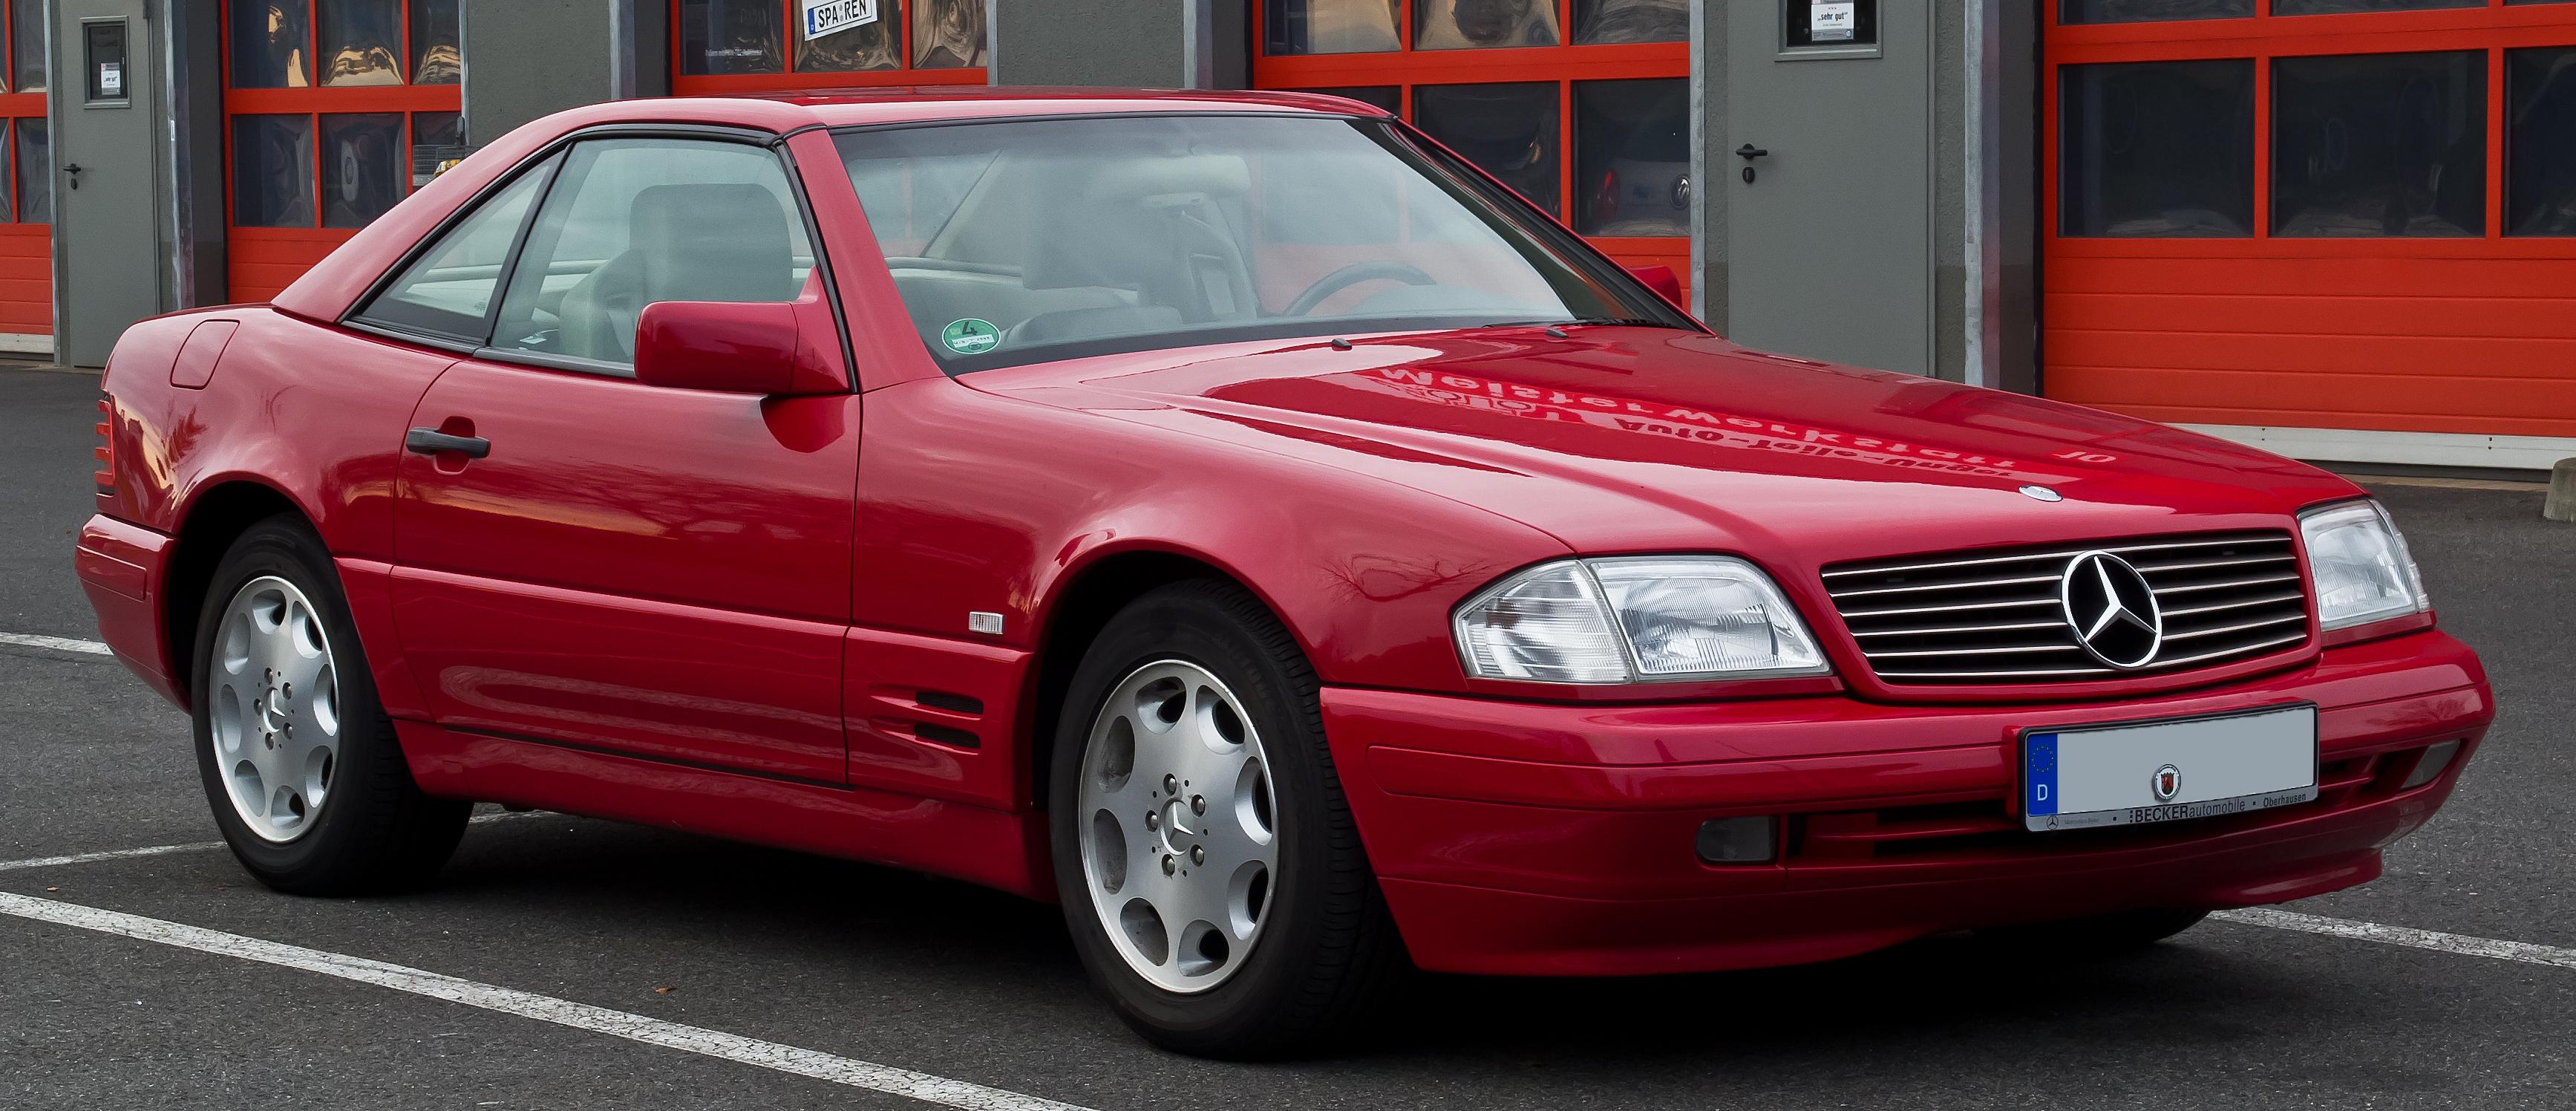 mercedes benz sl class r129 wikiwand rh wikiwand com 1996 Mercedes SL 1996 Mercedes  SL